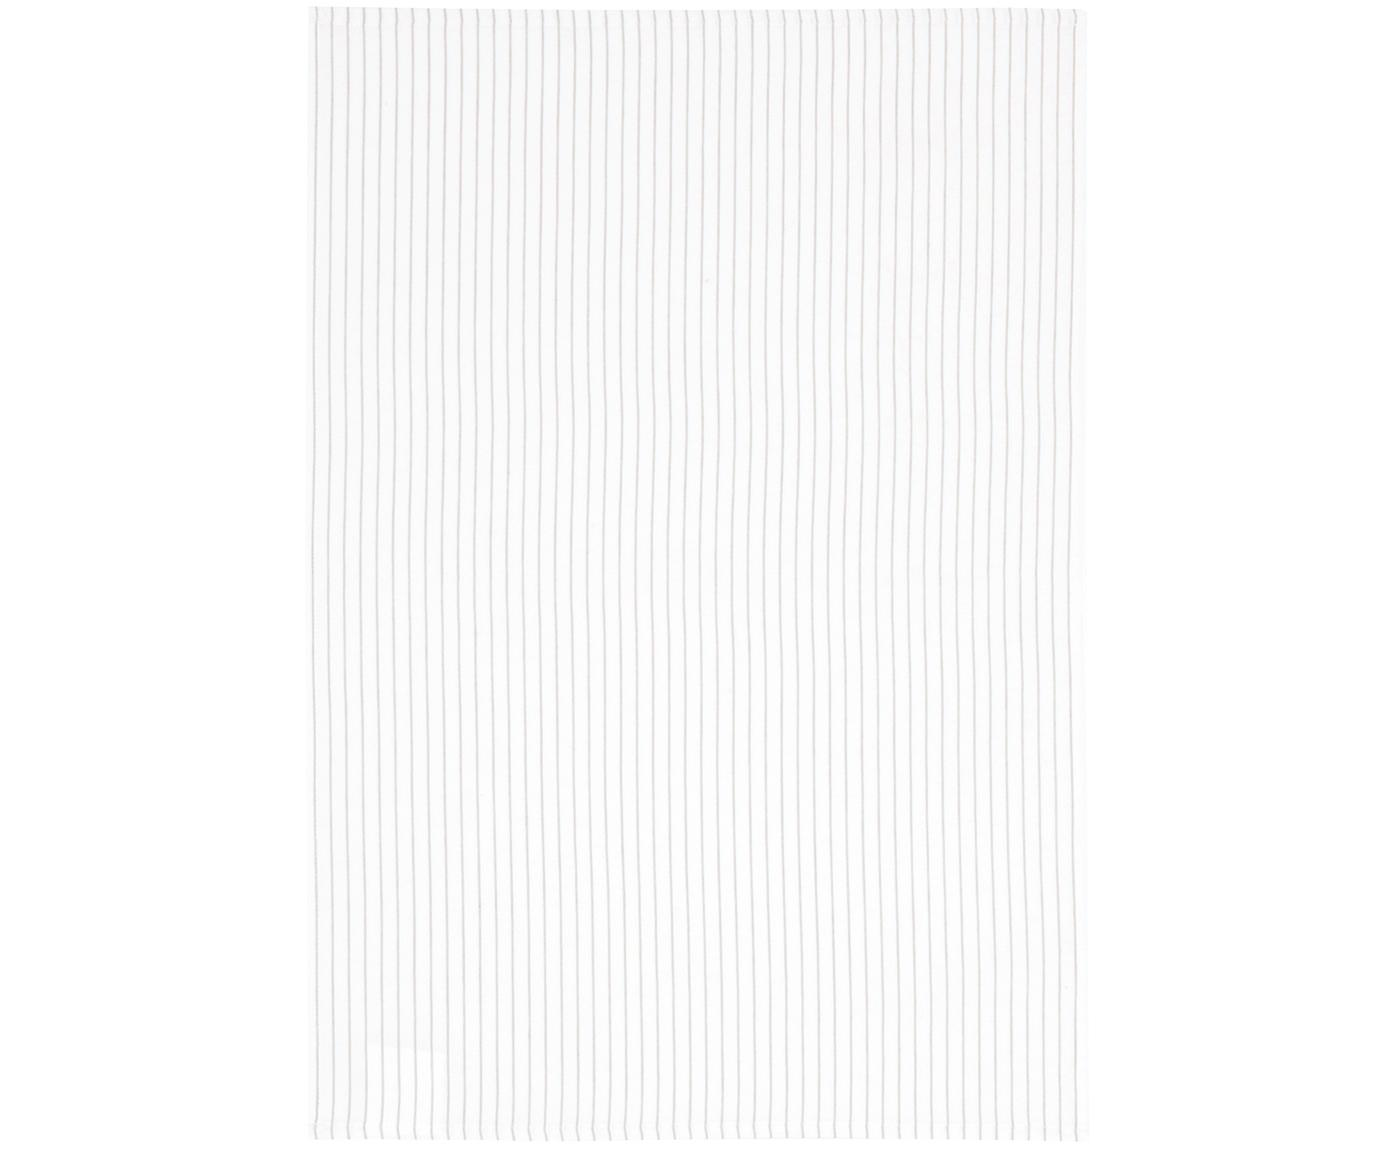 Geschirrtücher Nicole, 2 Stück, Baumwolle, Weiss, Beige, 50 x 70 cm